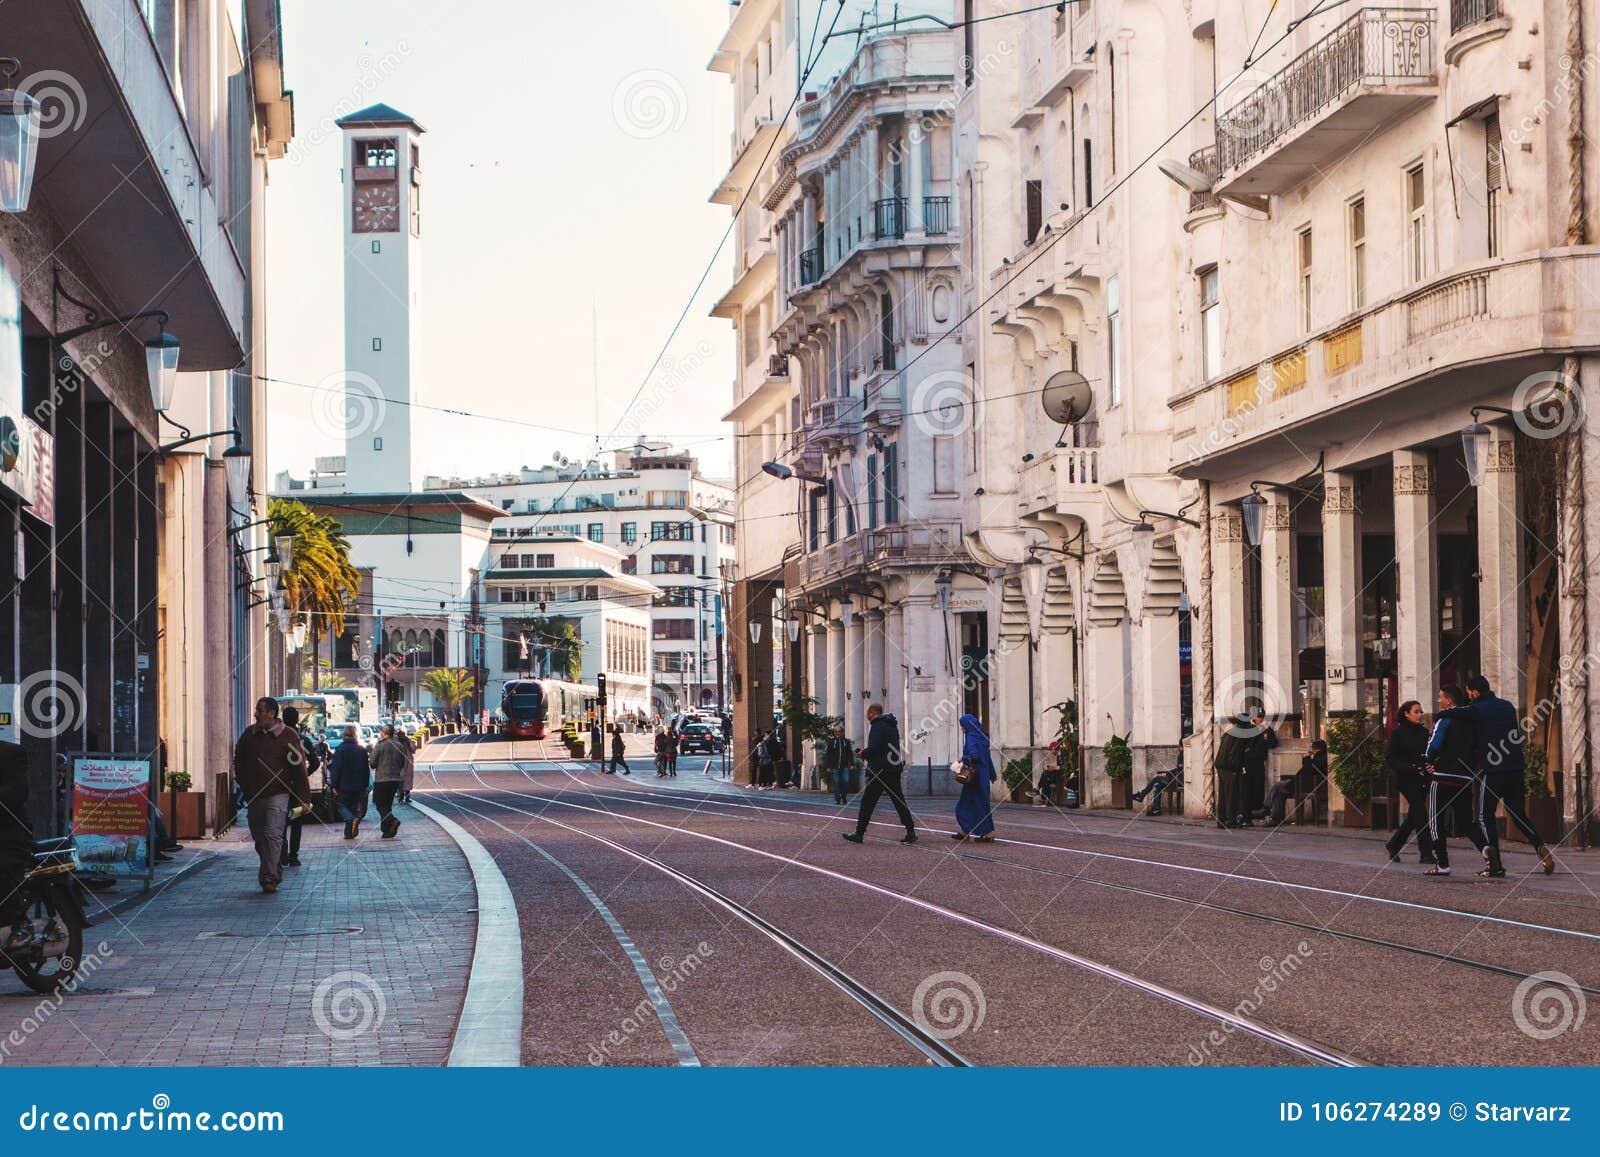 Cityscape of Casablanca - Morocco